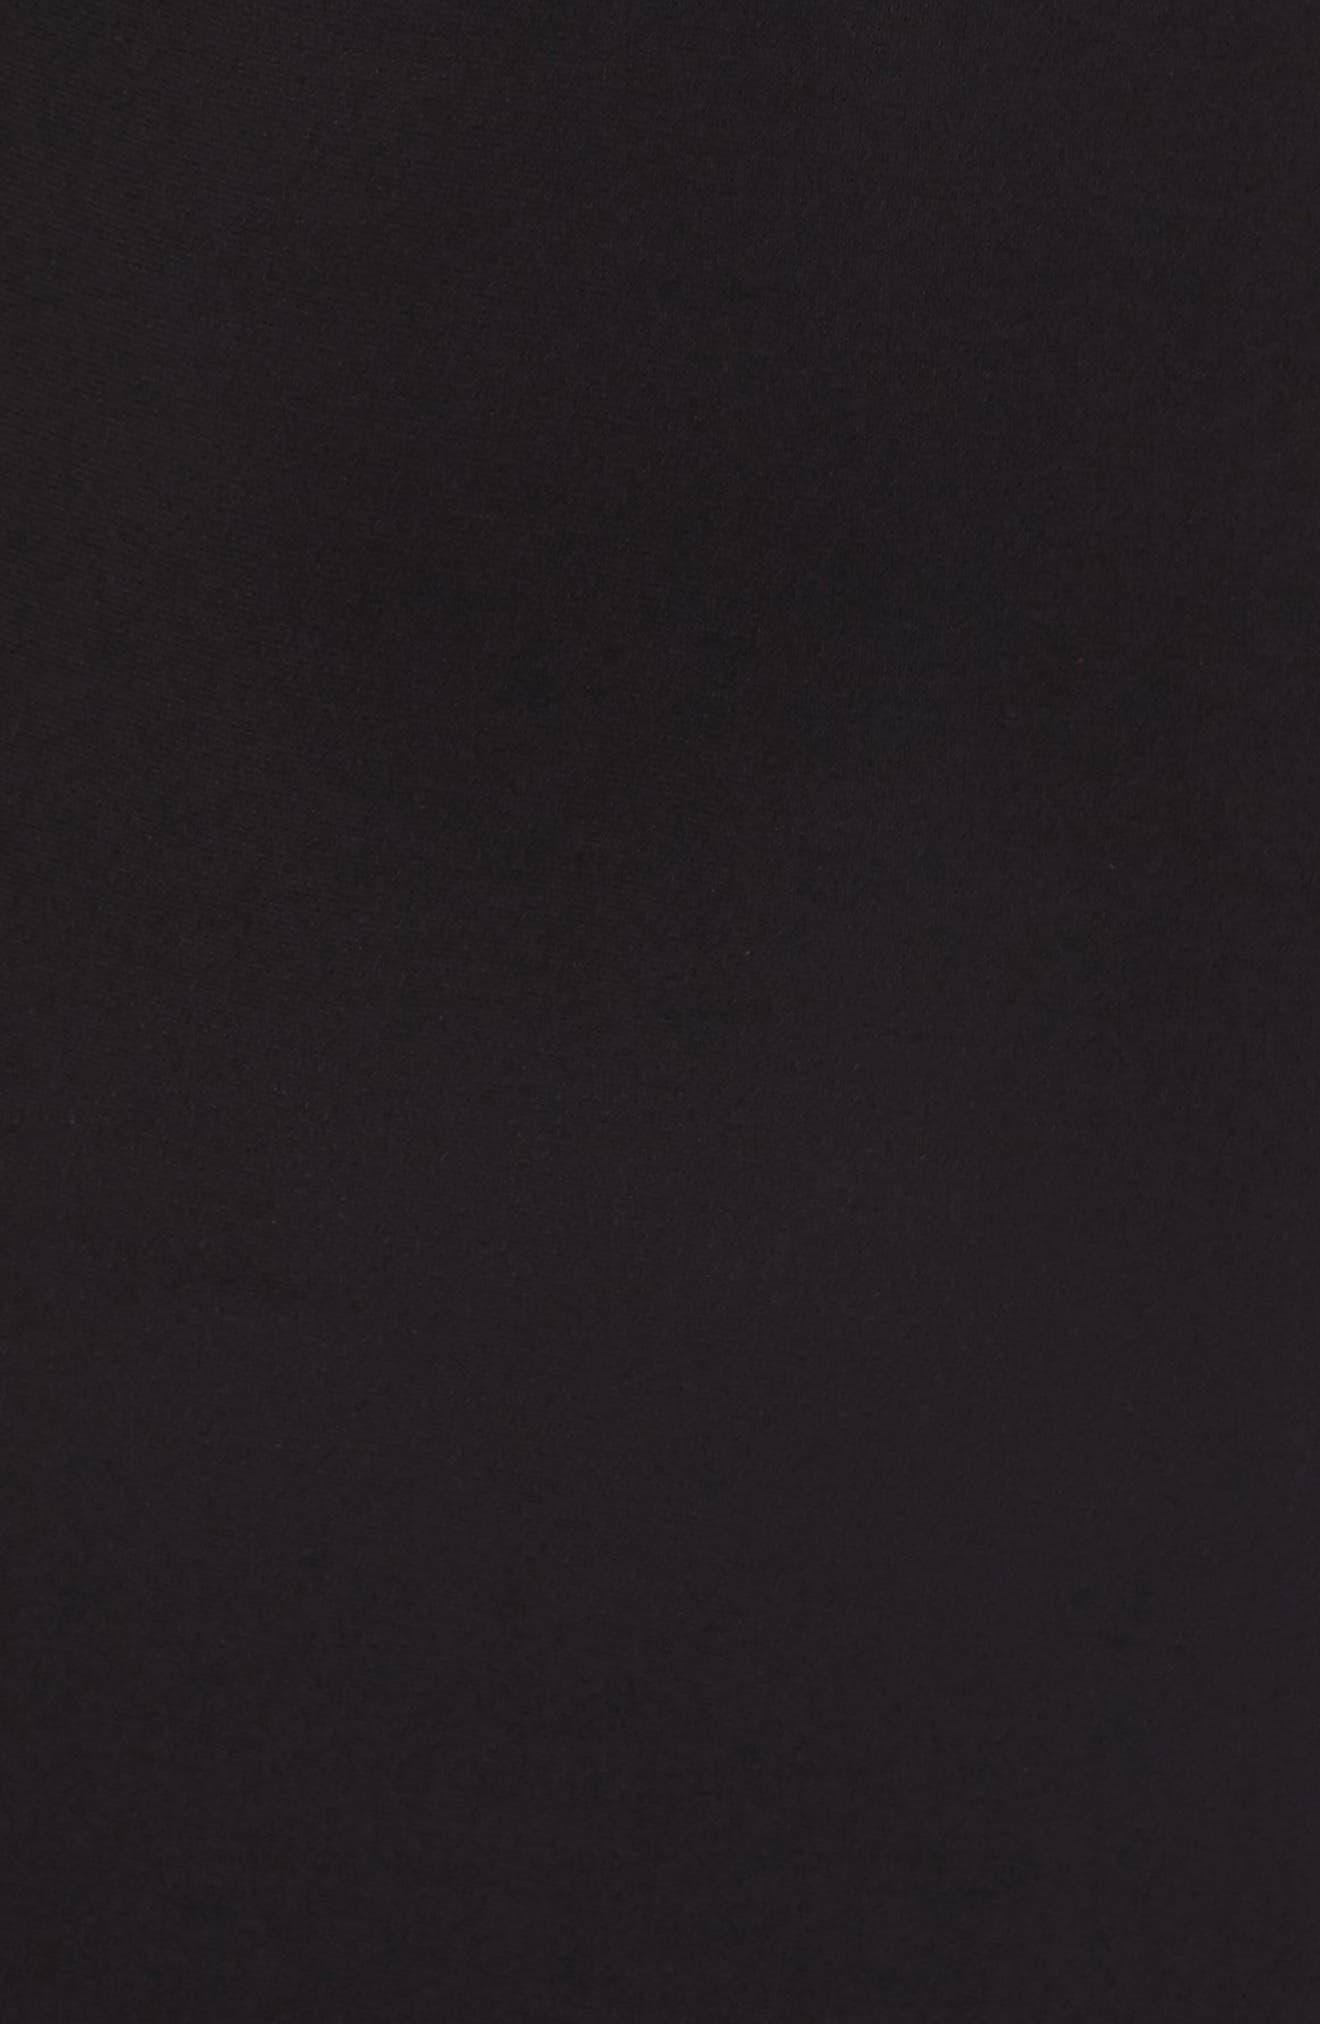 Sequin Embellished Gown,                             Alternate thumbnail 5, color,                             Black